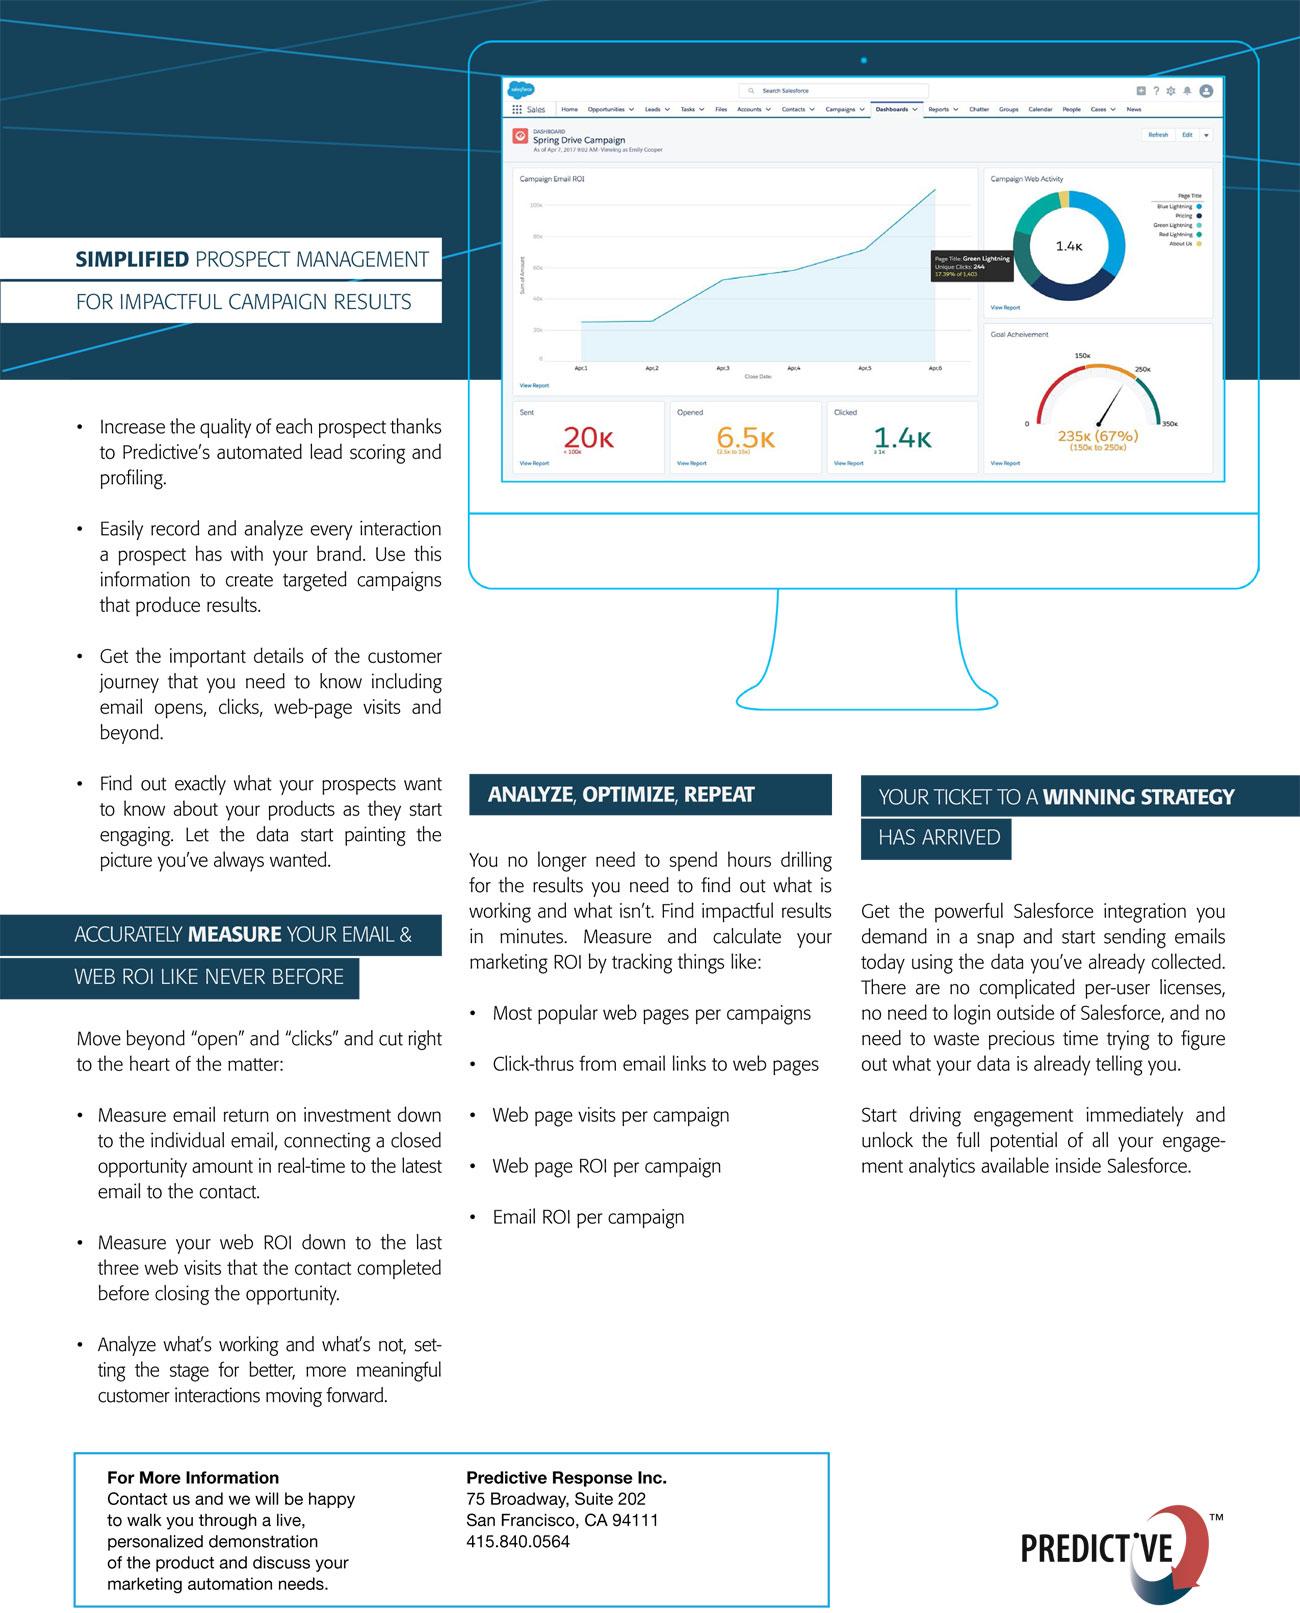 Predictive datasheet page 2